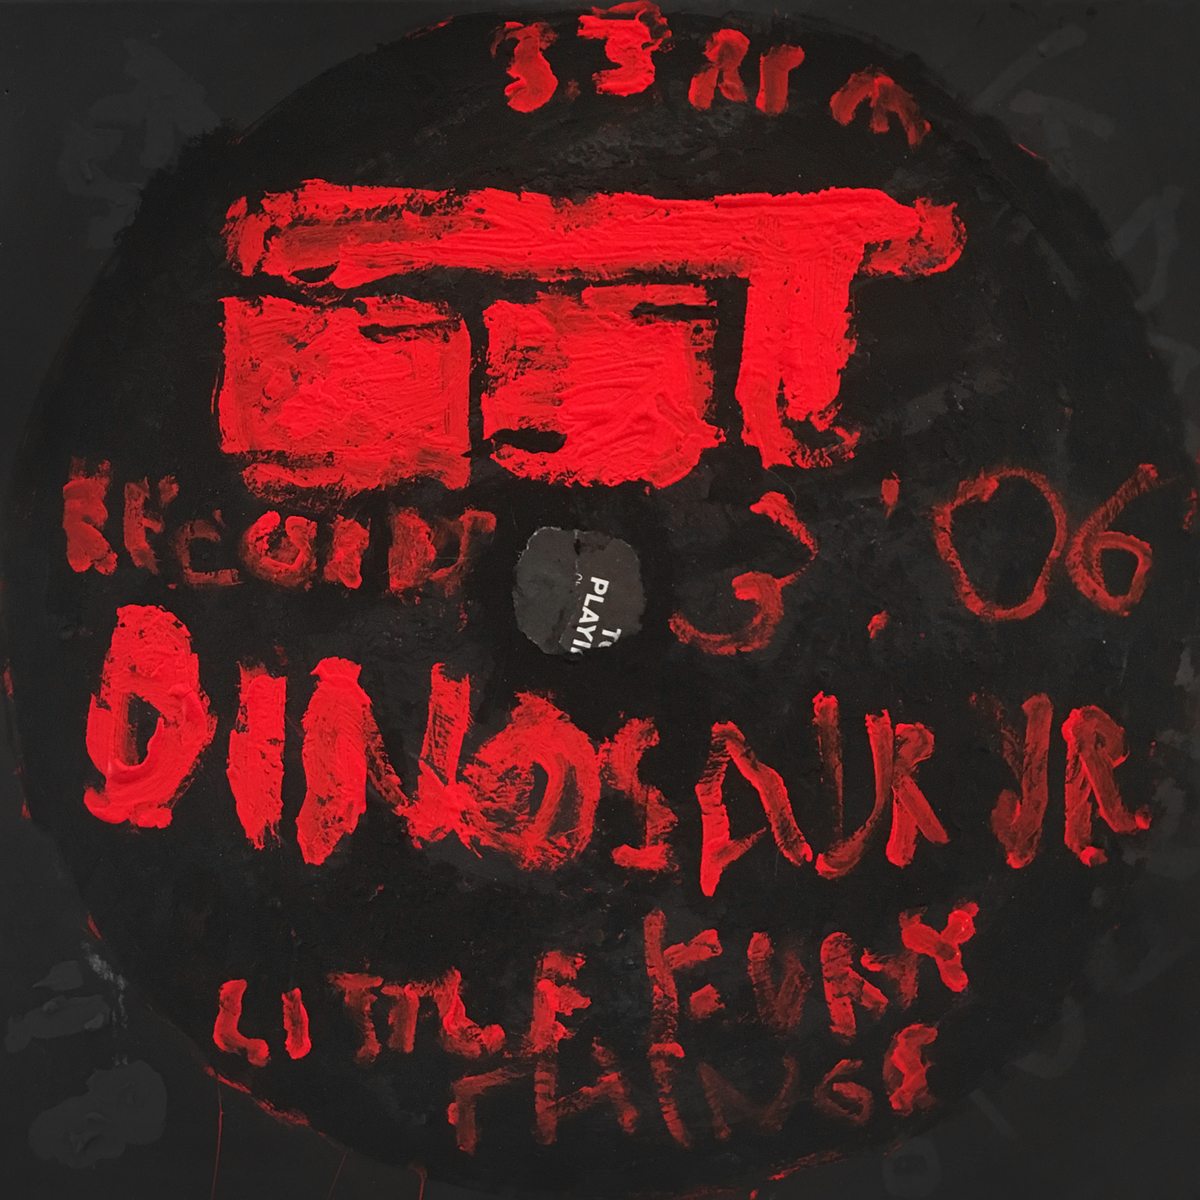 Dinosaur Jr. / Little fury things